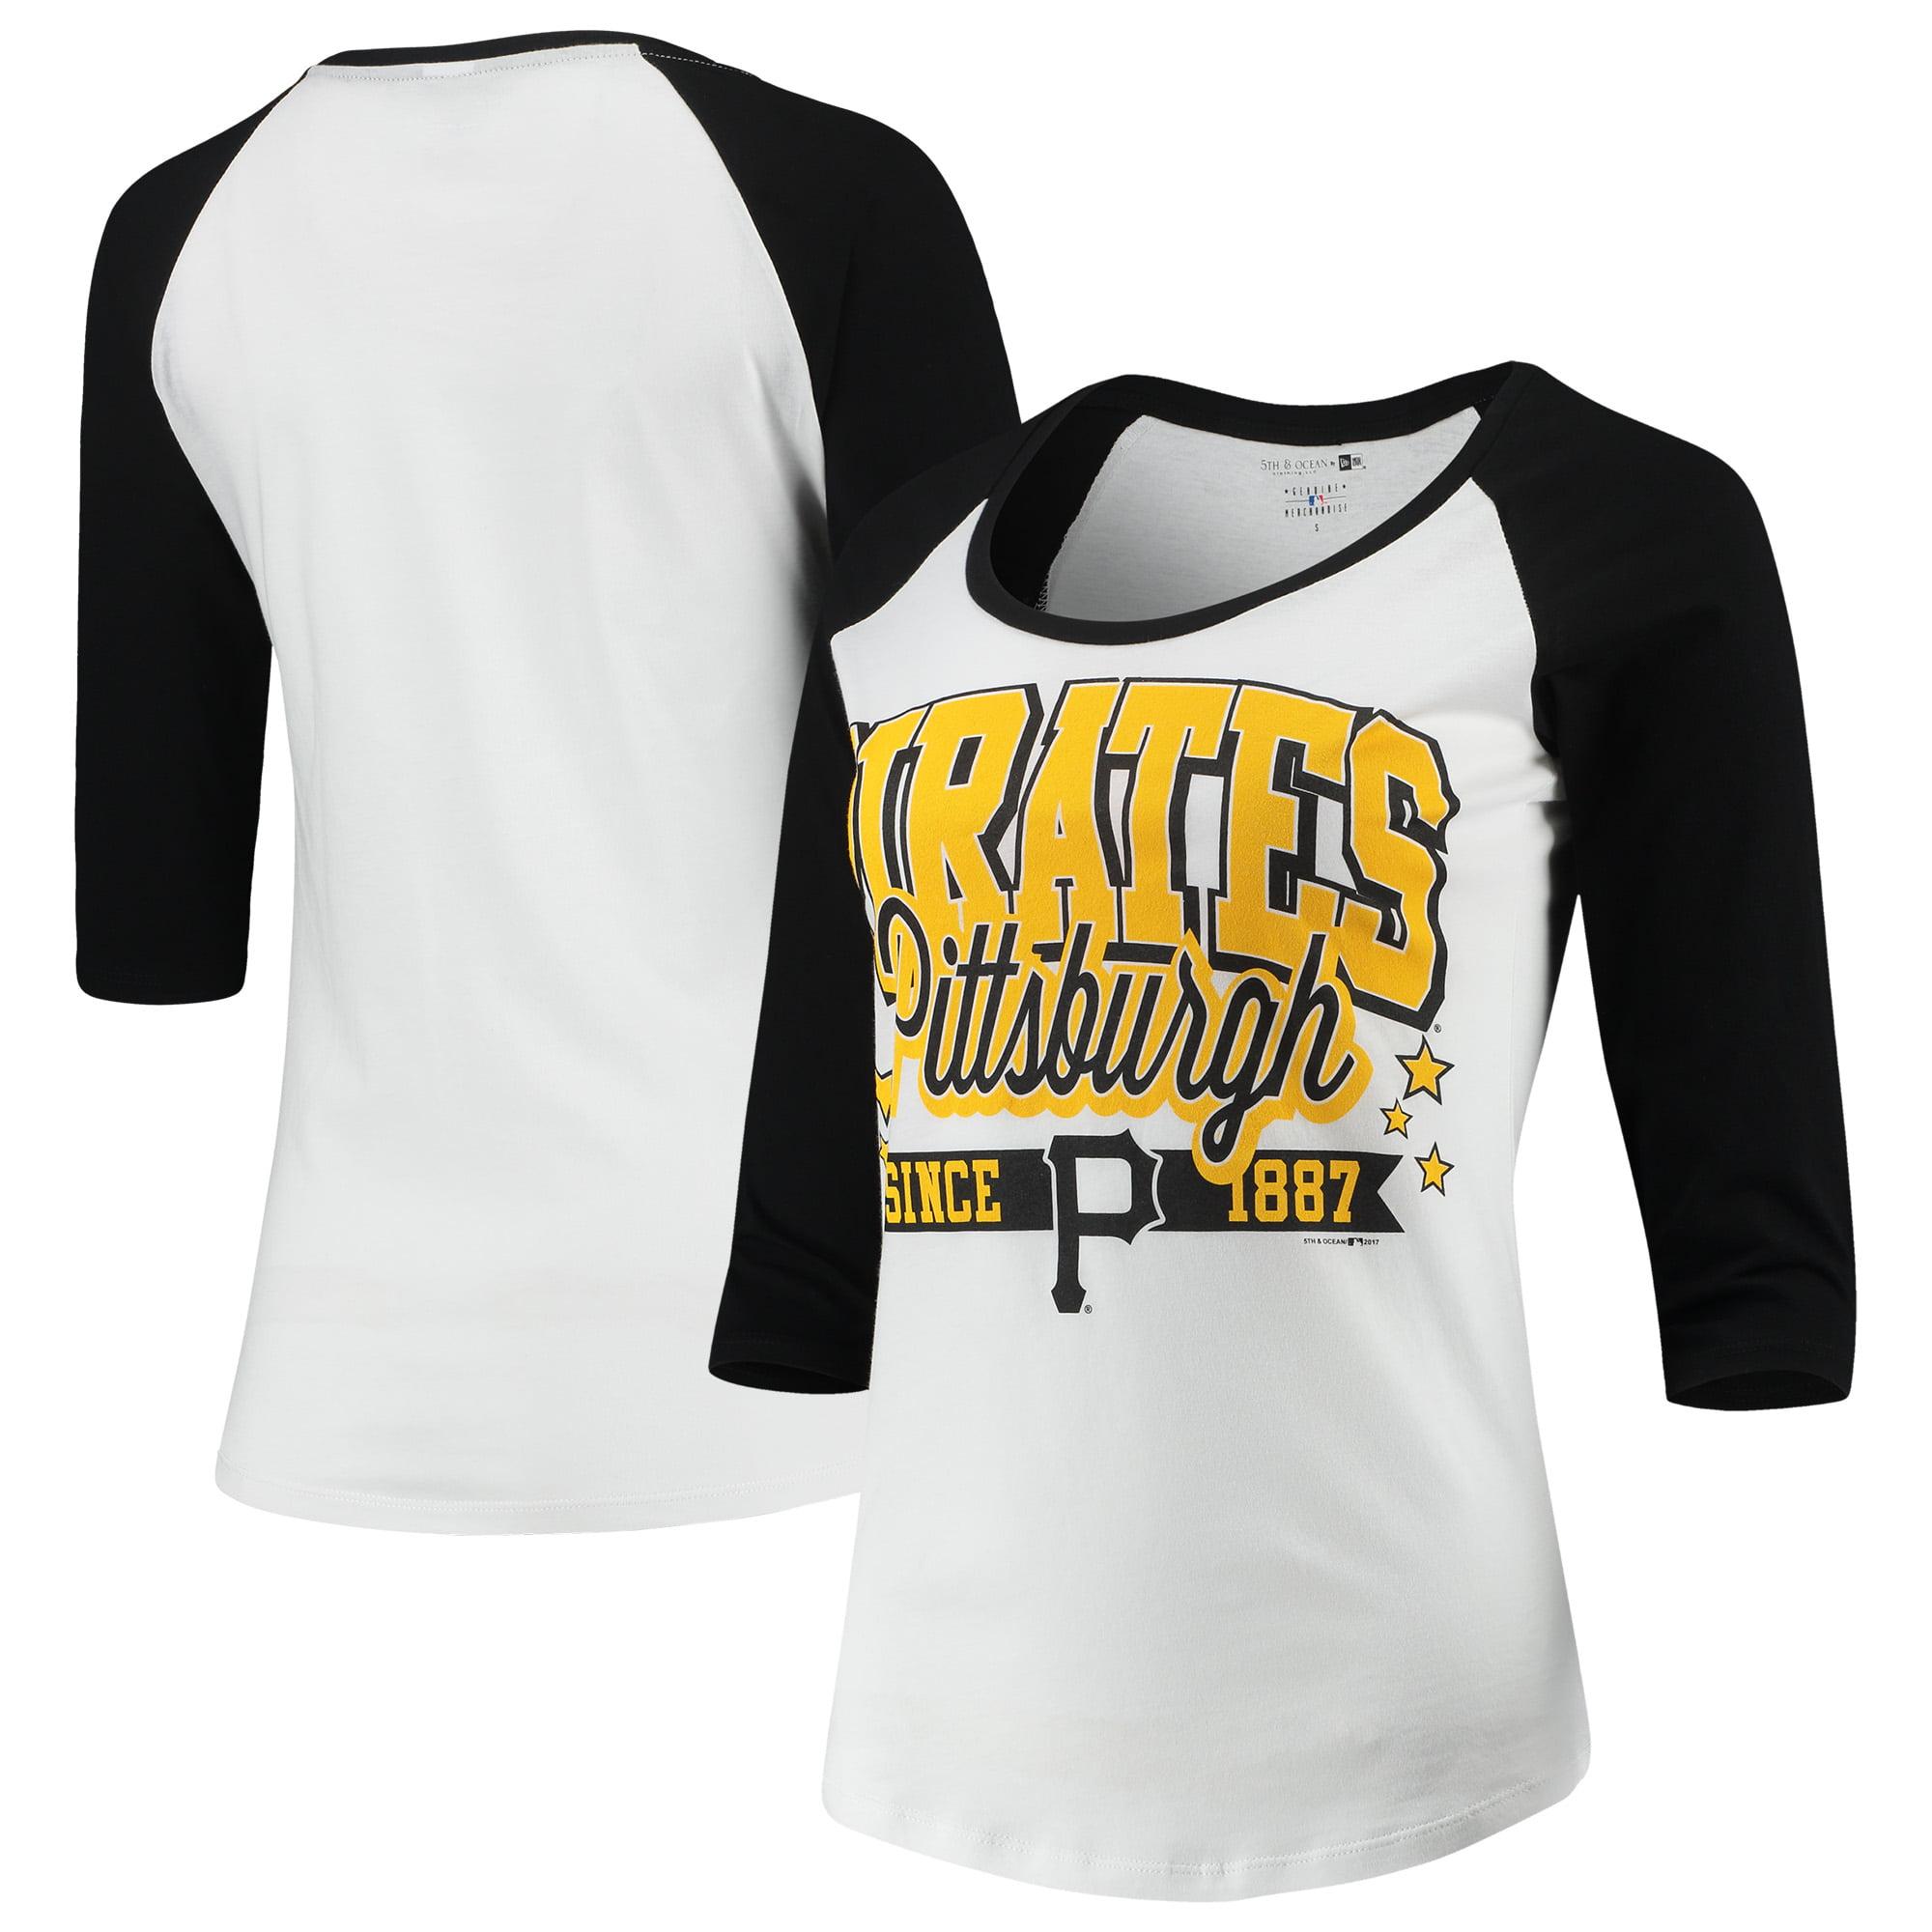 Pittsburgh Pirates 5th & Ocean by New Era Women's Team Banner 3/4-Sleeve Raglan T-Shirt - White/Black